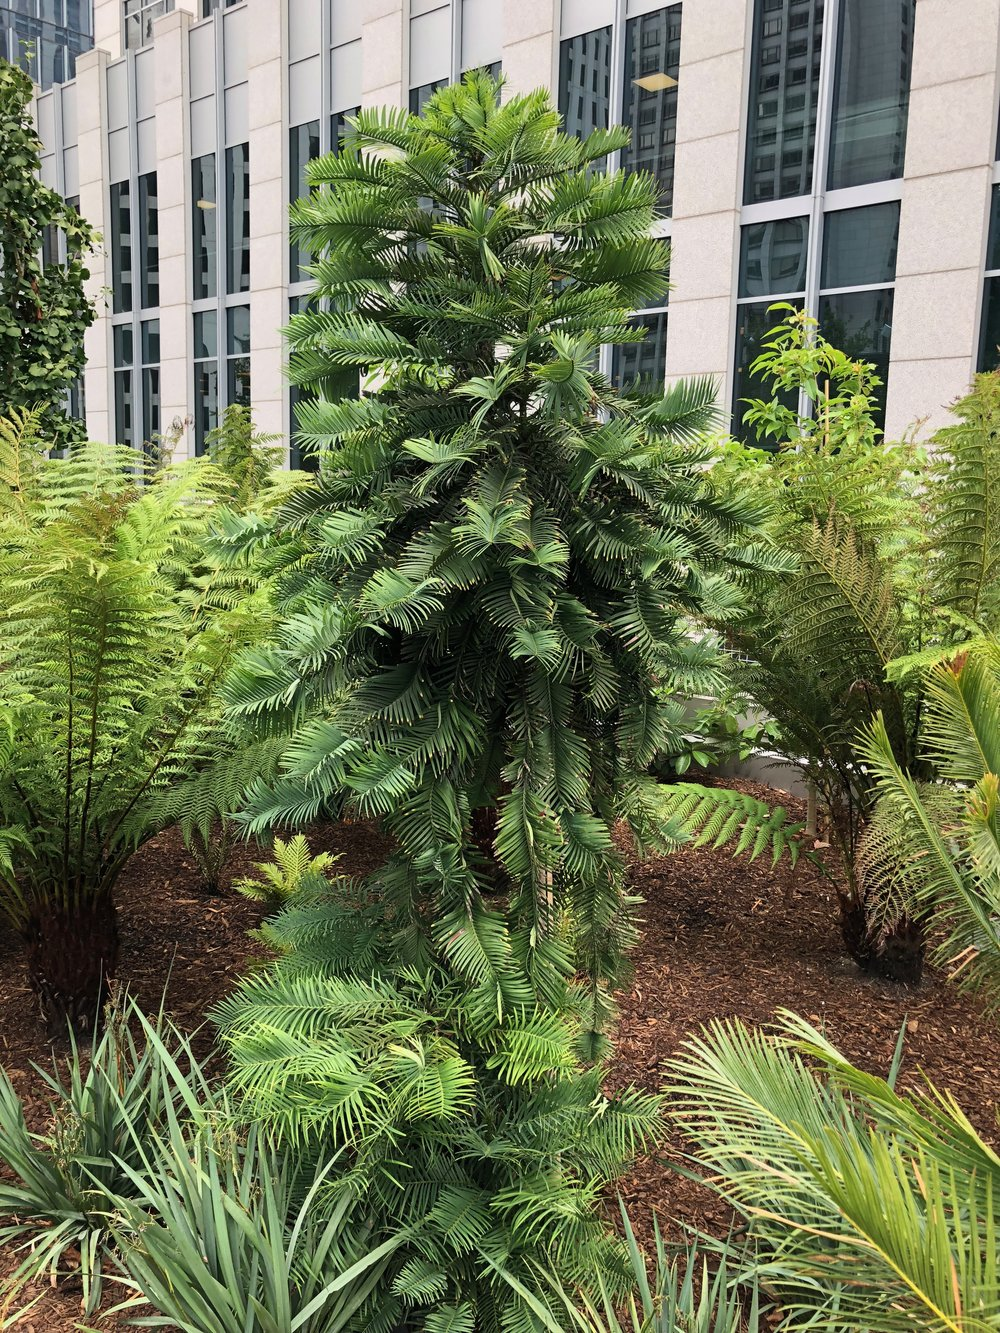 Wollemi pine ( Wollemi nobilis )